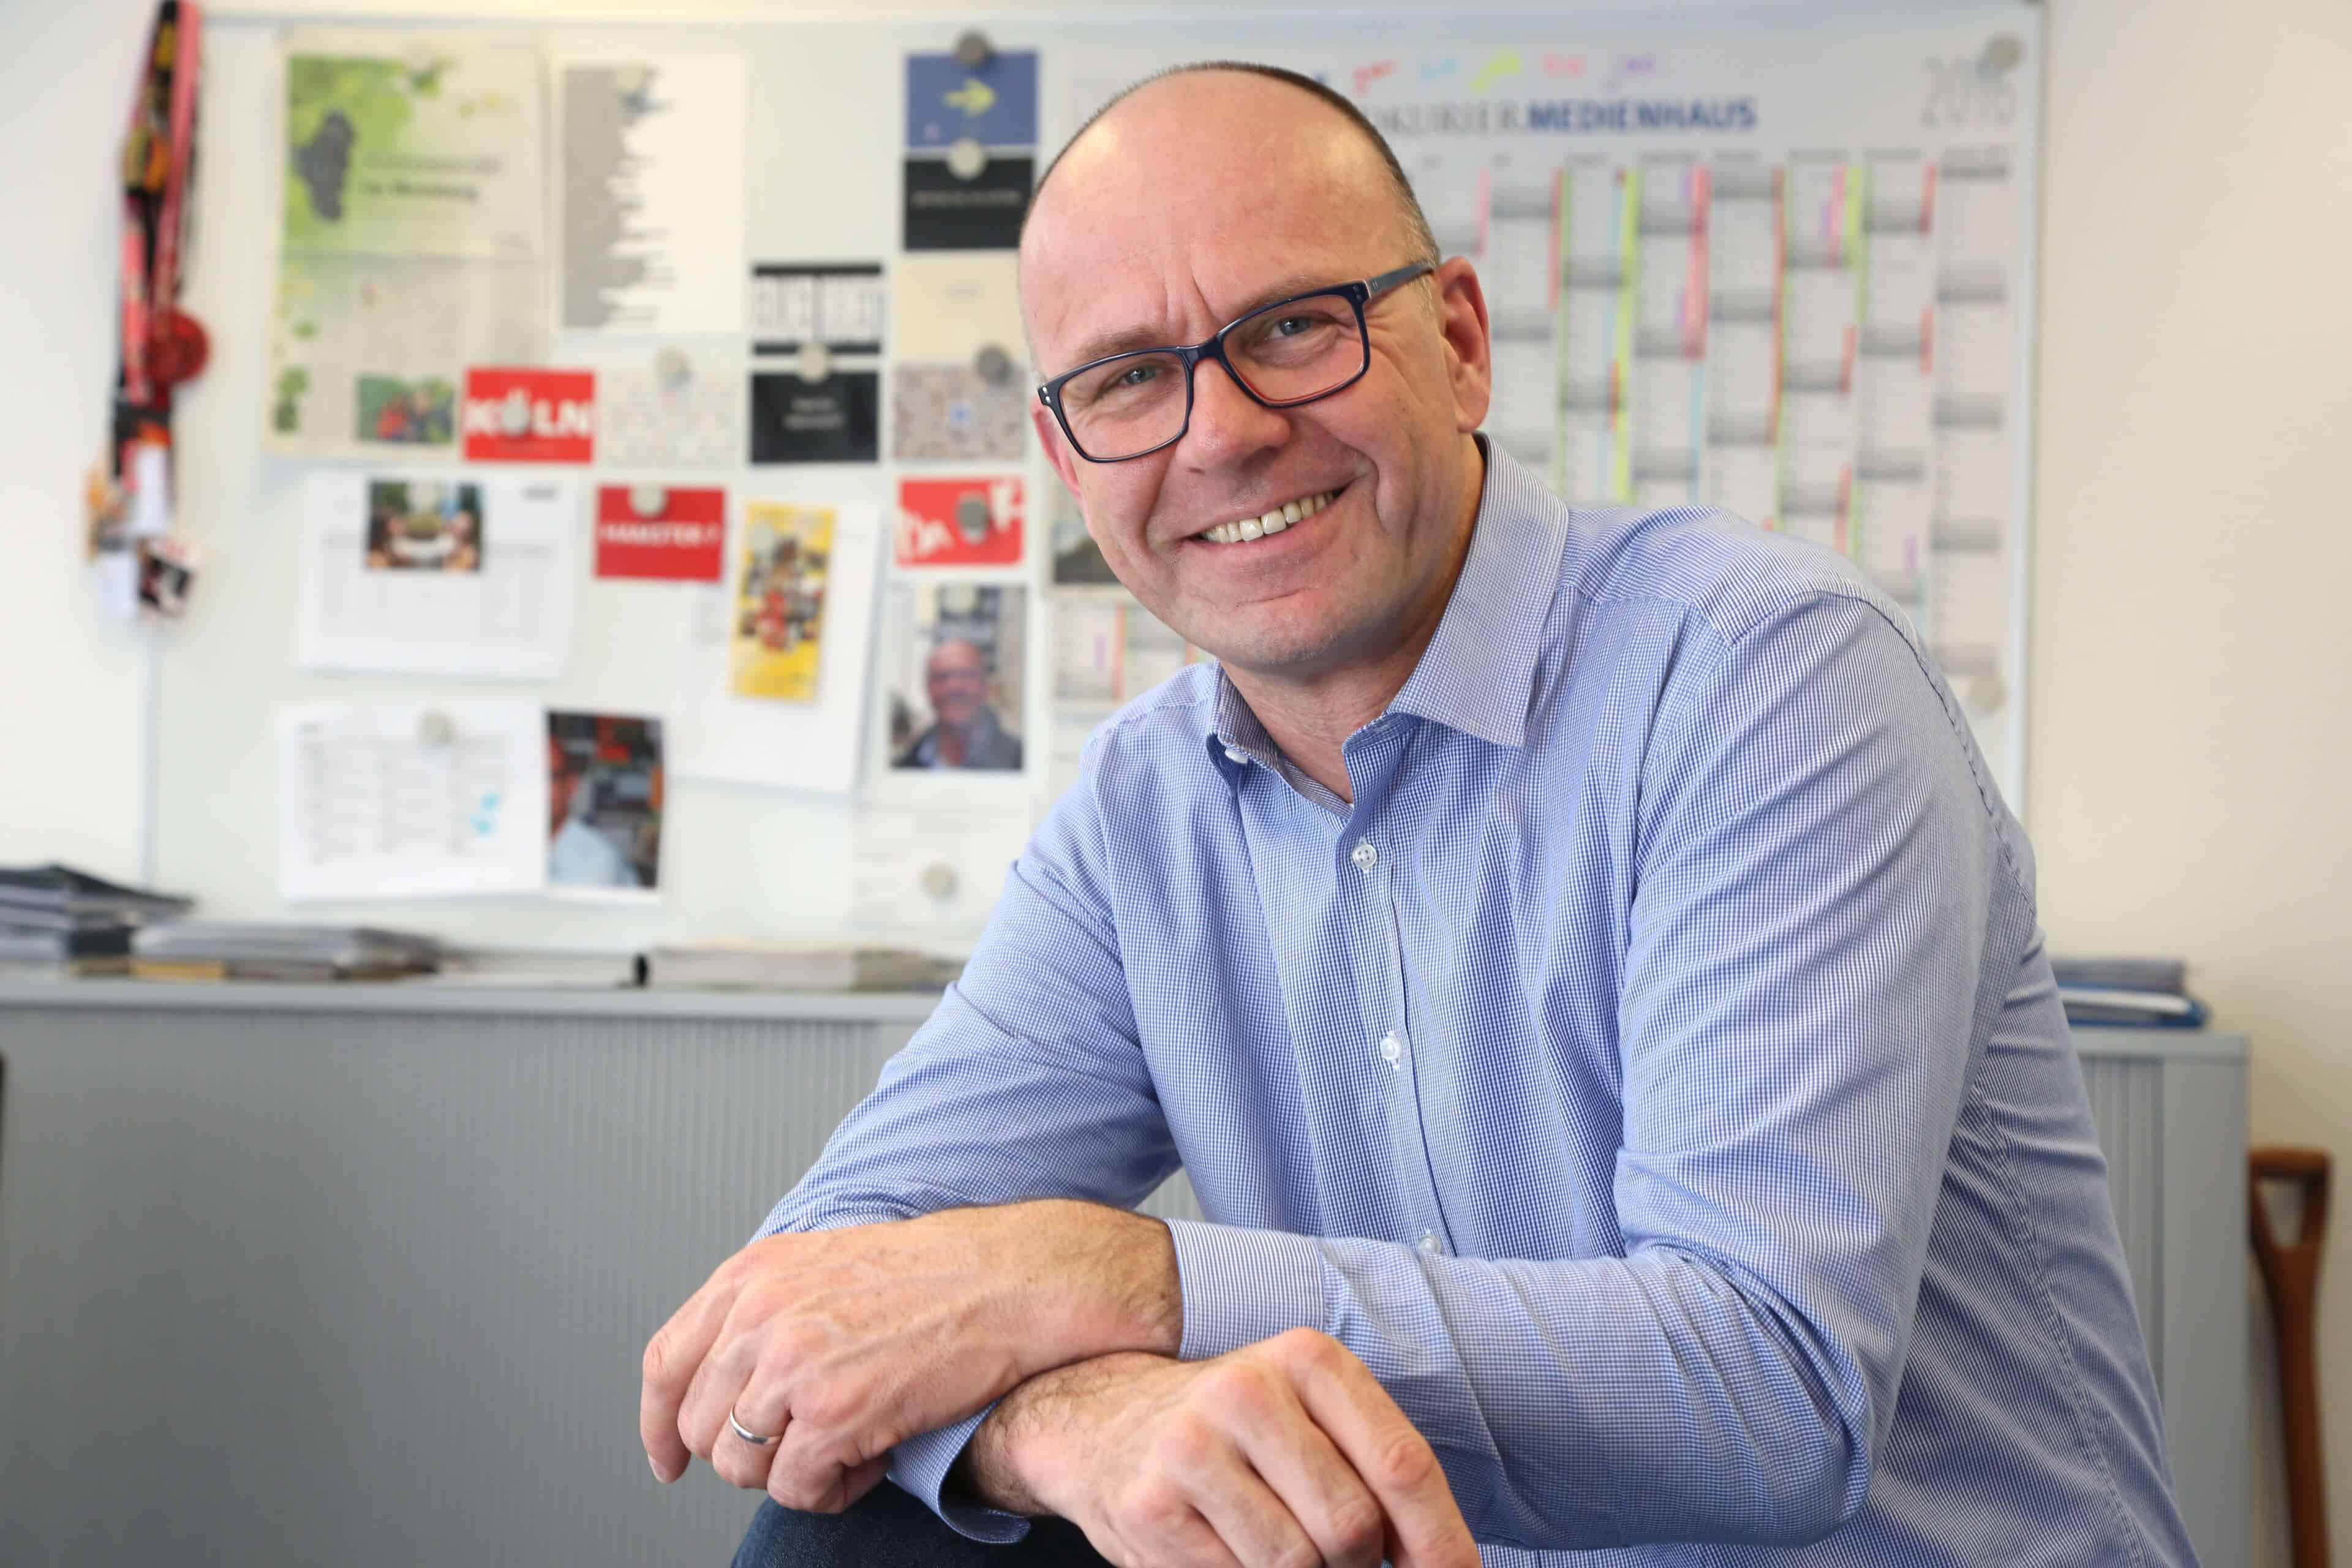 Jörg Braun, Leitung Lokalredaktion Singen, SÜDKURIER GmbH, Medienhaus